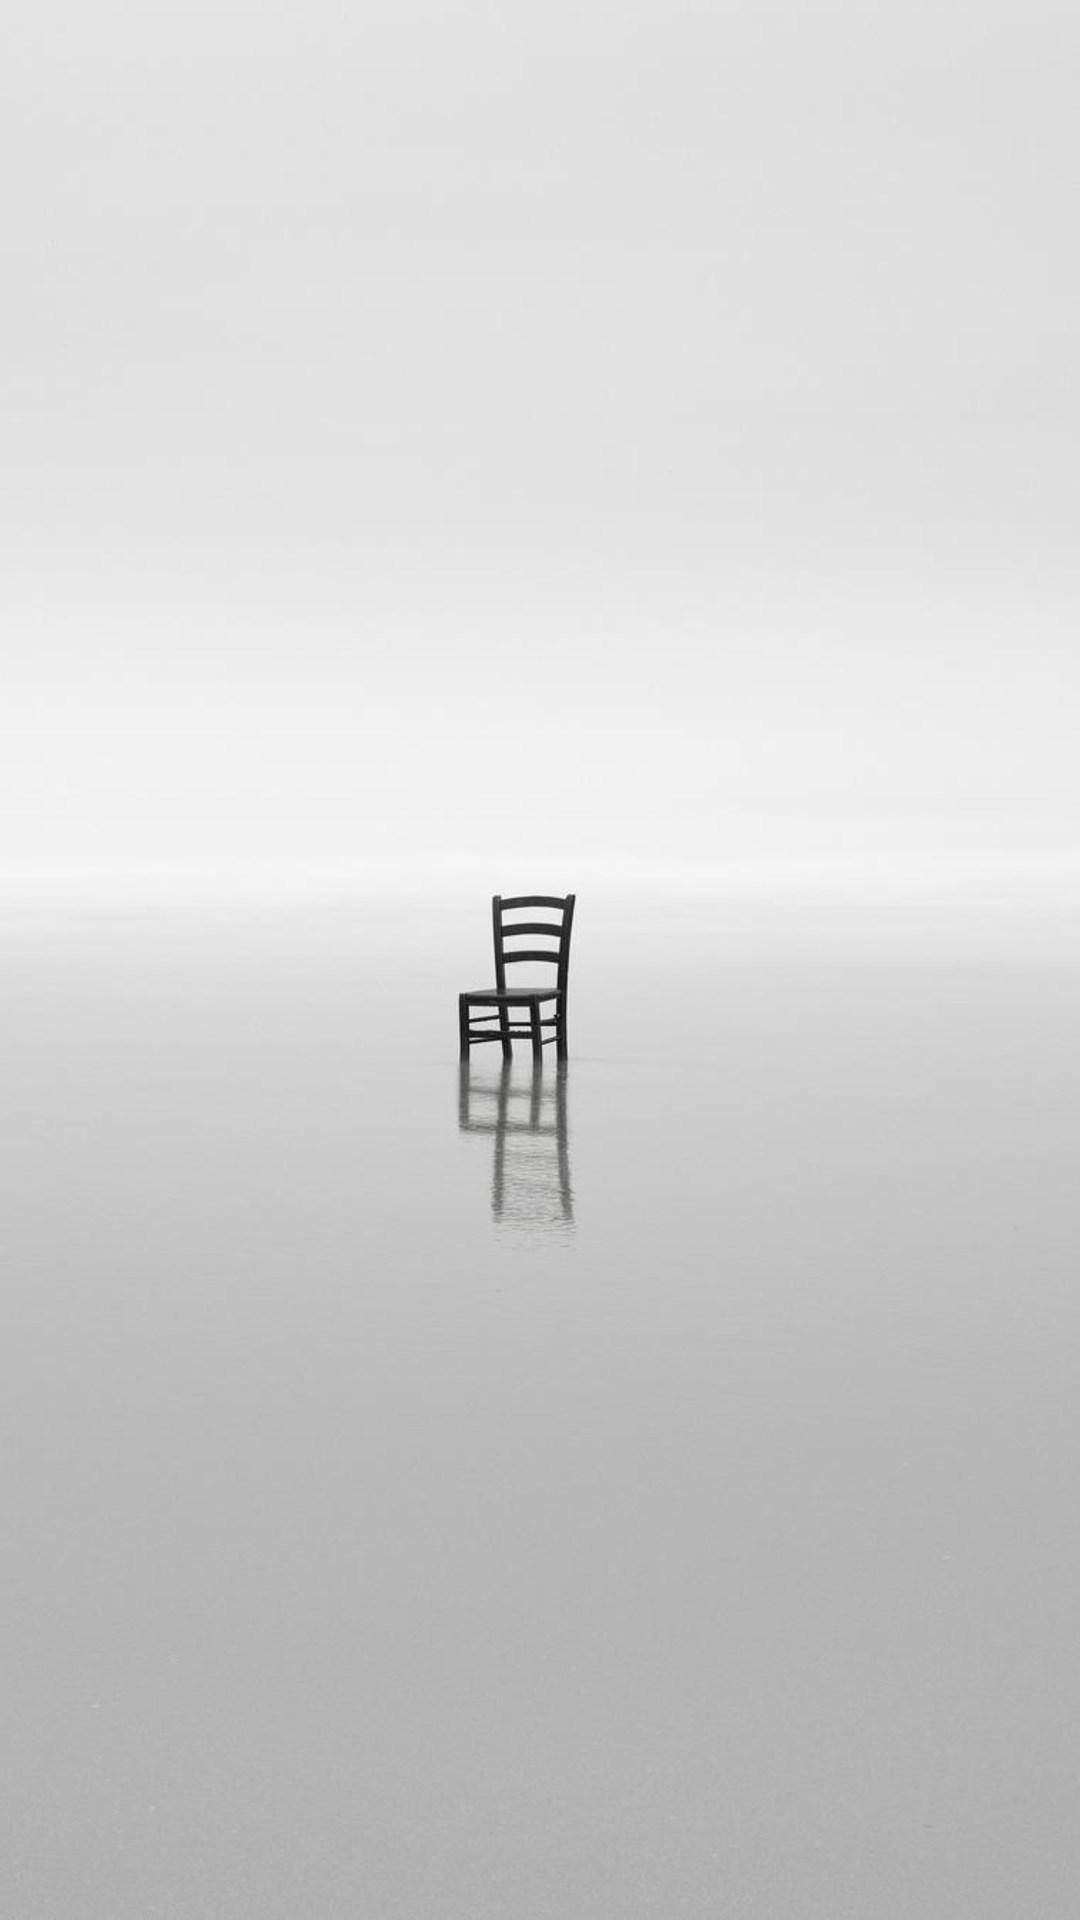 Chair Minimalism Image Wallpaper